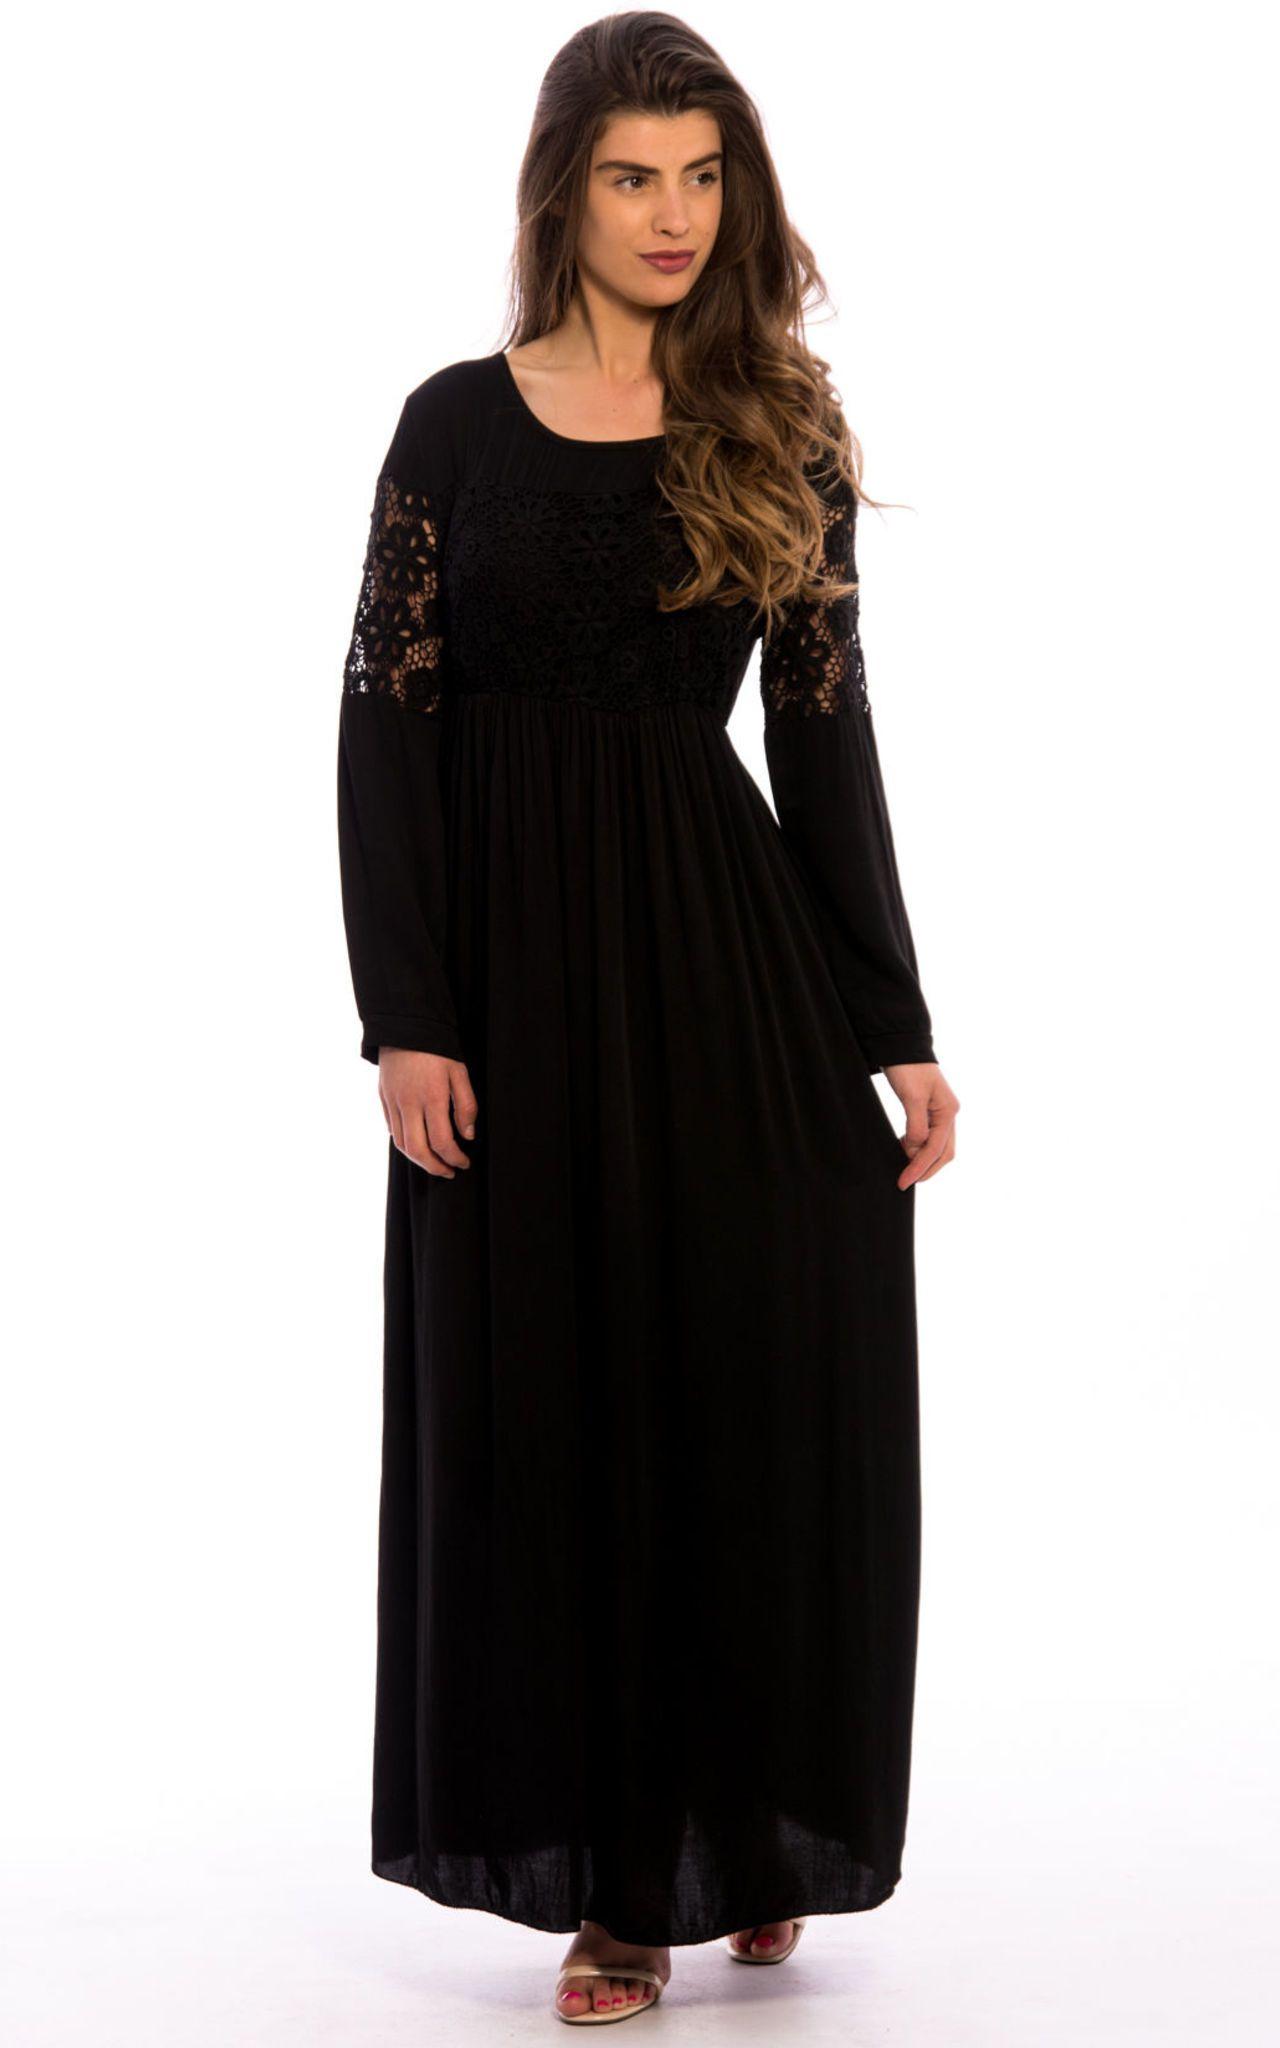 Crochet lace detail long sleeves maxi dress black by npire